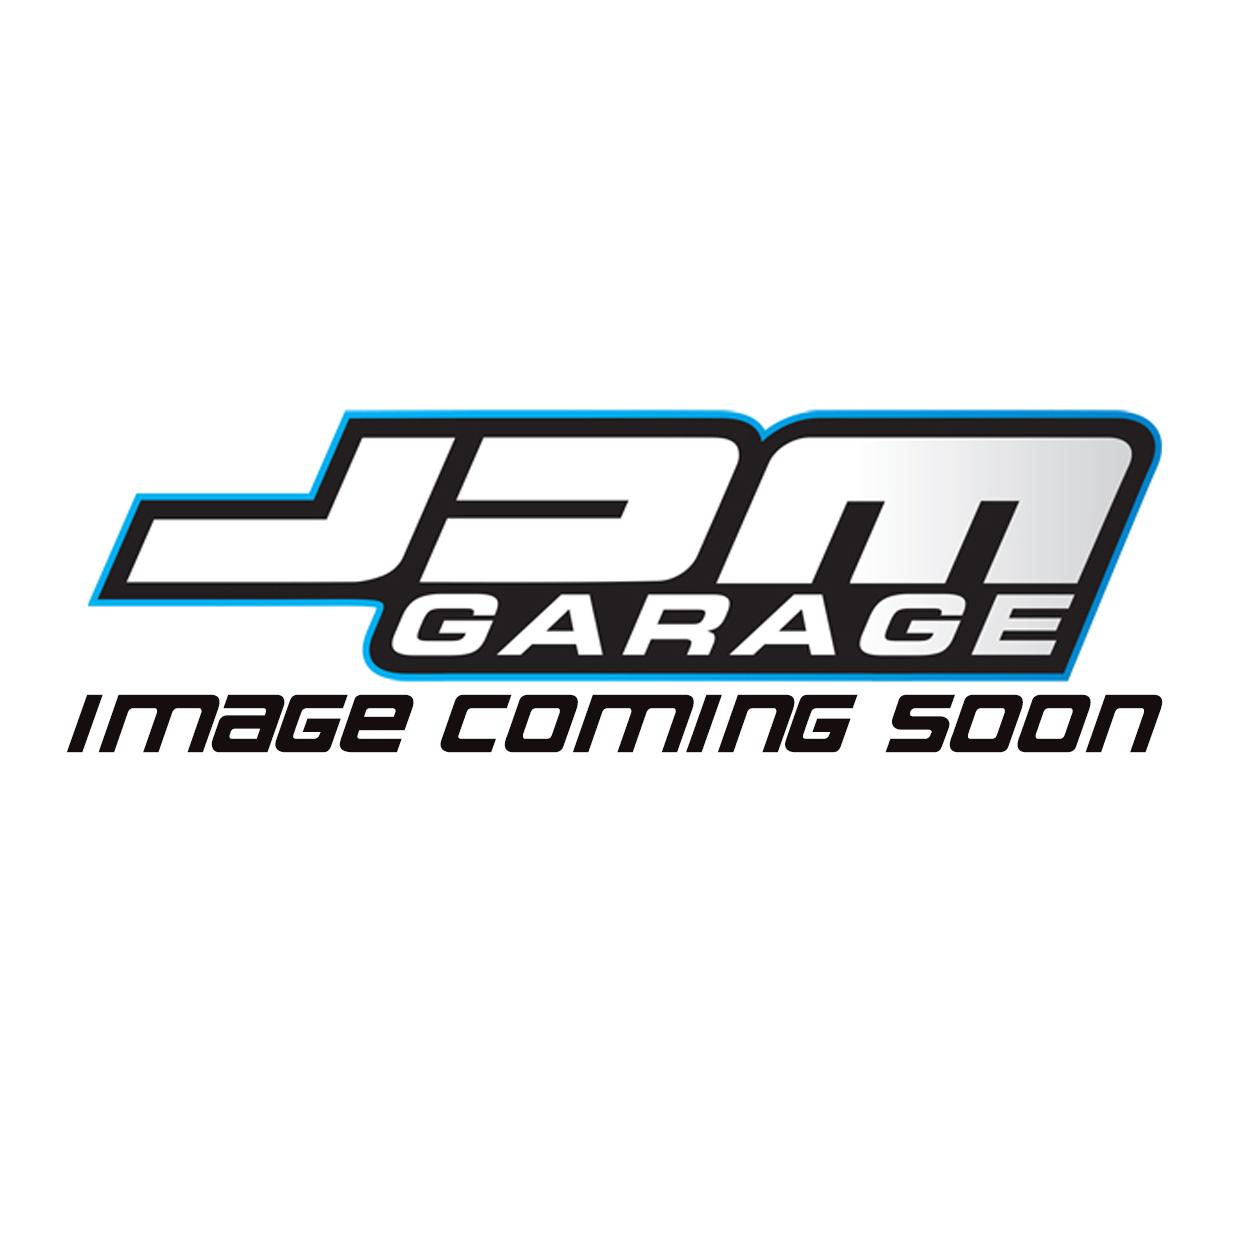 SR20DET Complete Bent Cam Engine - With Ancillaries - S15 200SX